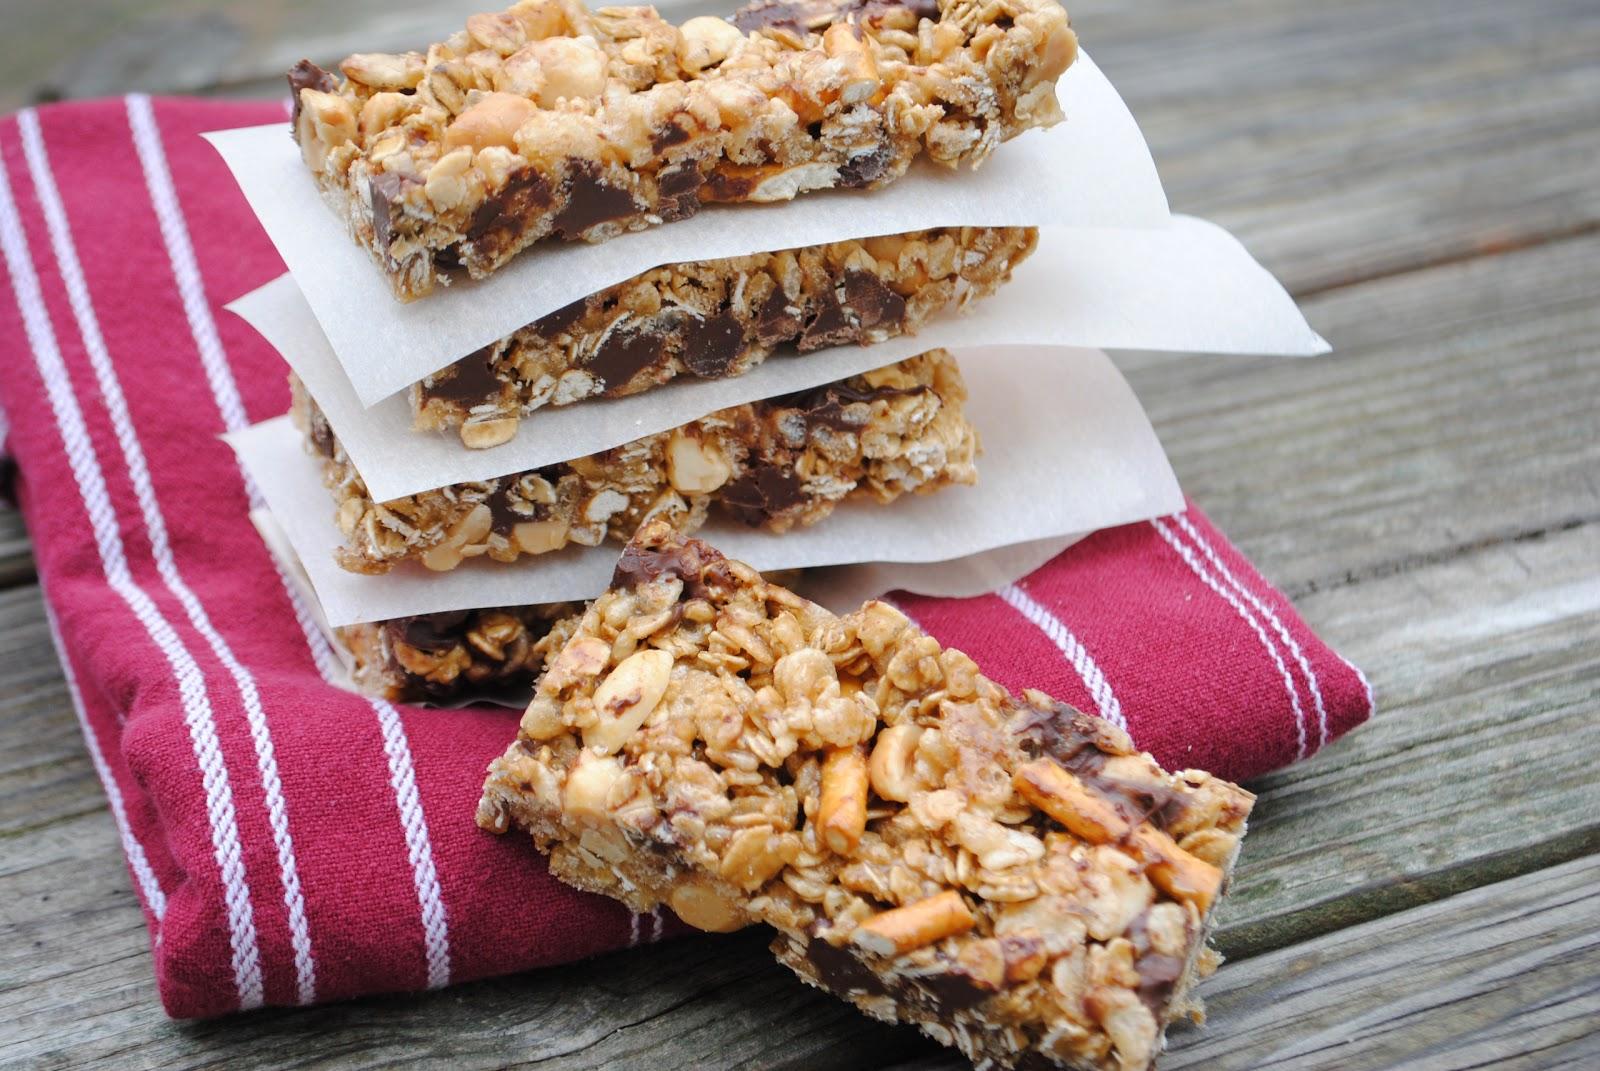 Chocolate Chip Granola Bars - Shugary Sweets